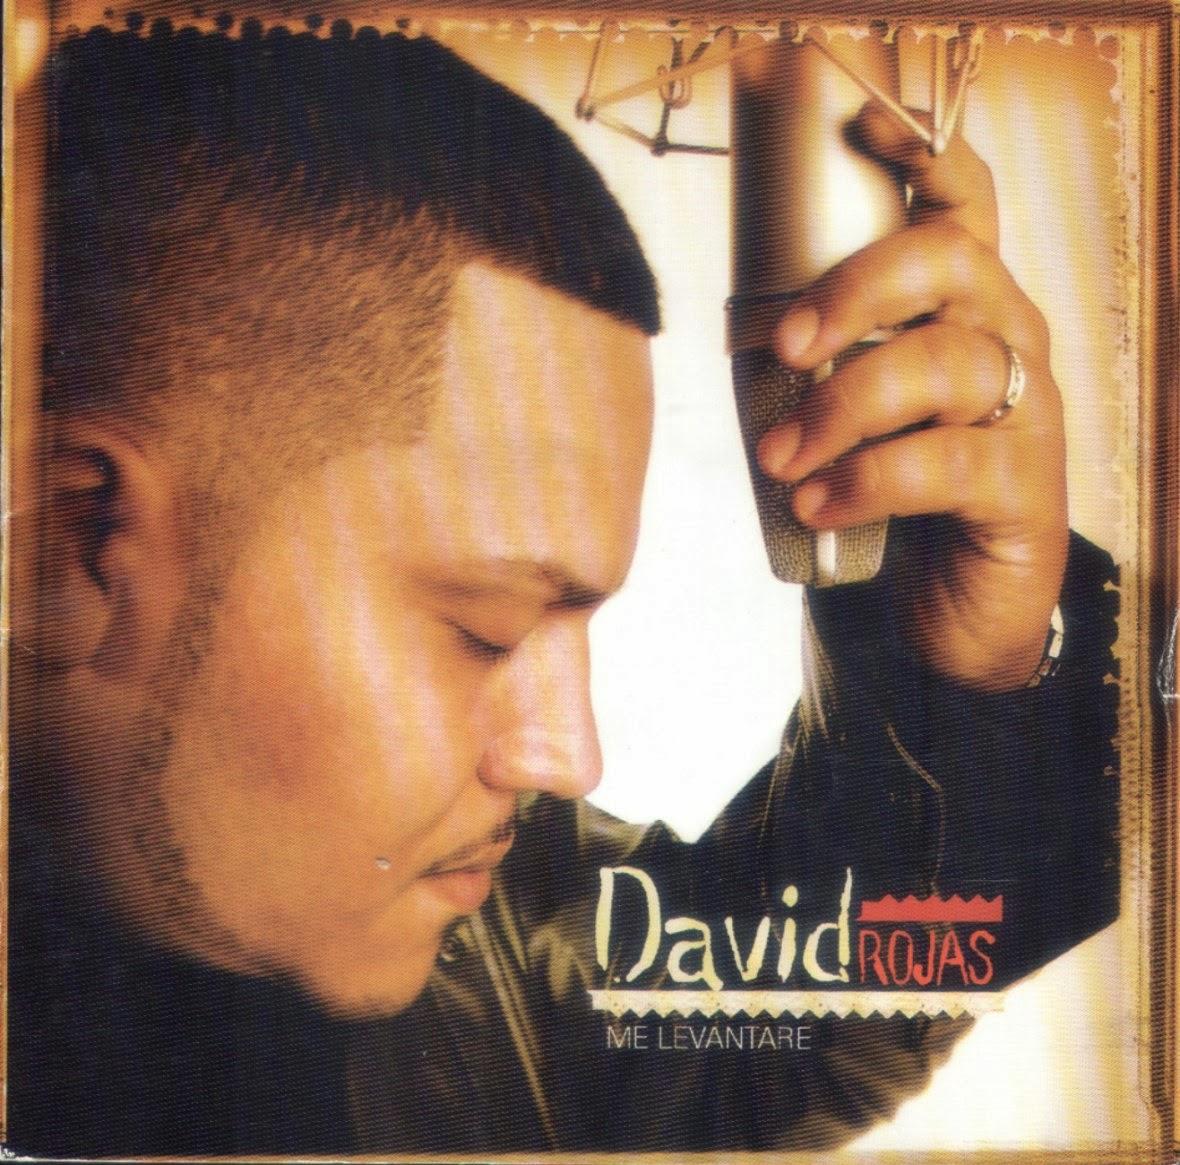 David Rojas-Me Levantaré-